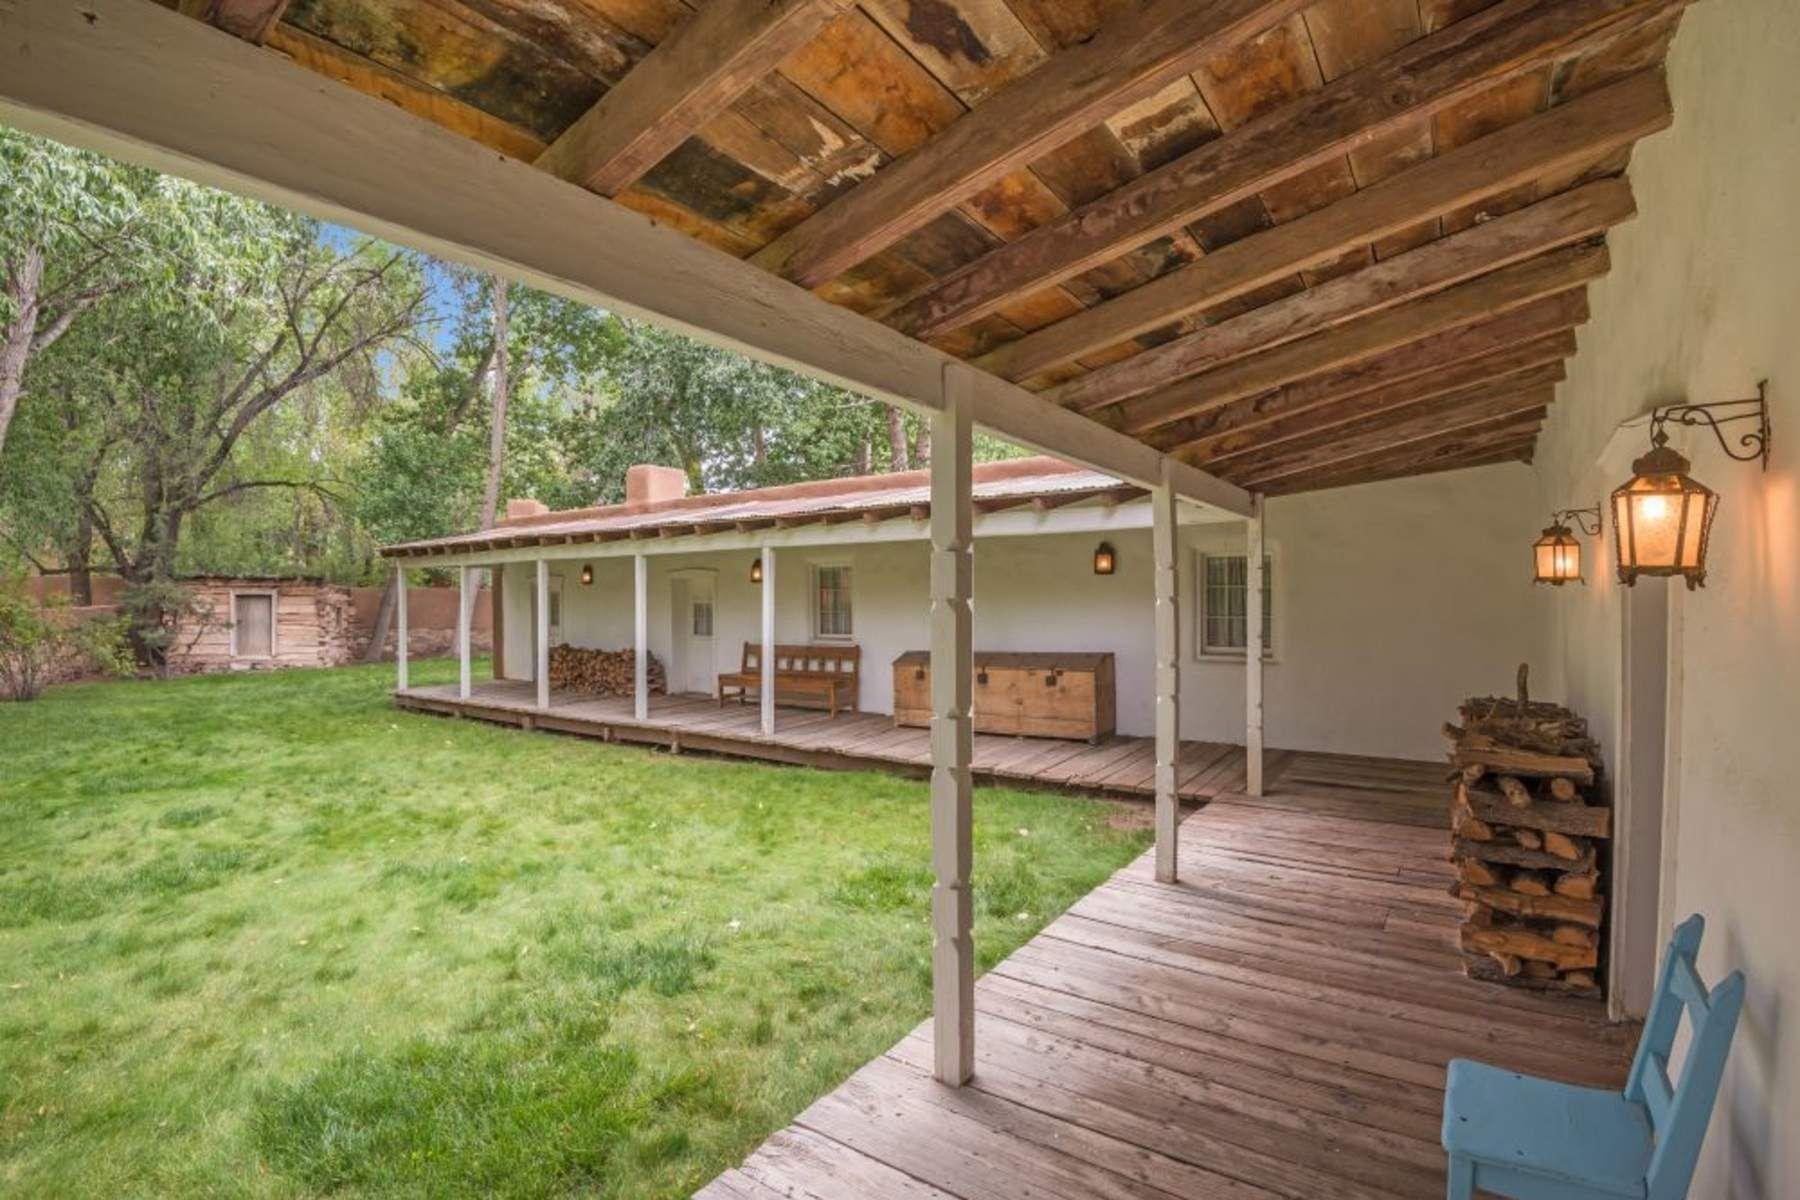 واحد منزل الأسرة للـ Sale في 885 Palace Avenue 885 E Palace Ave, Santa Fe, New Mexico, 87501 United States